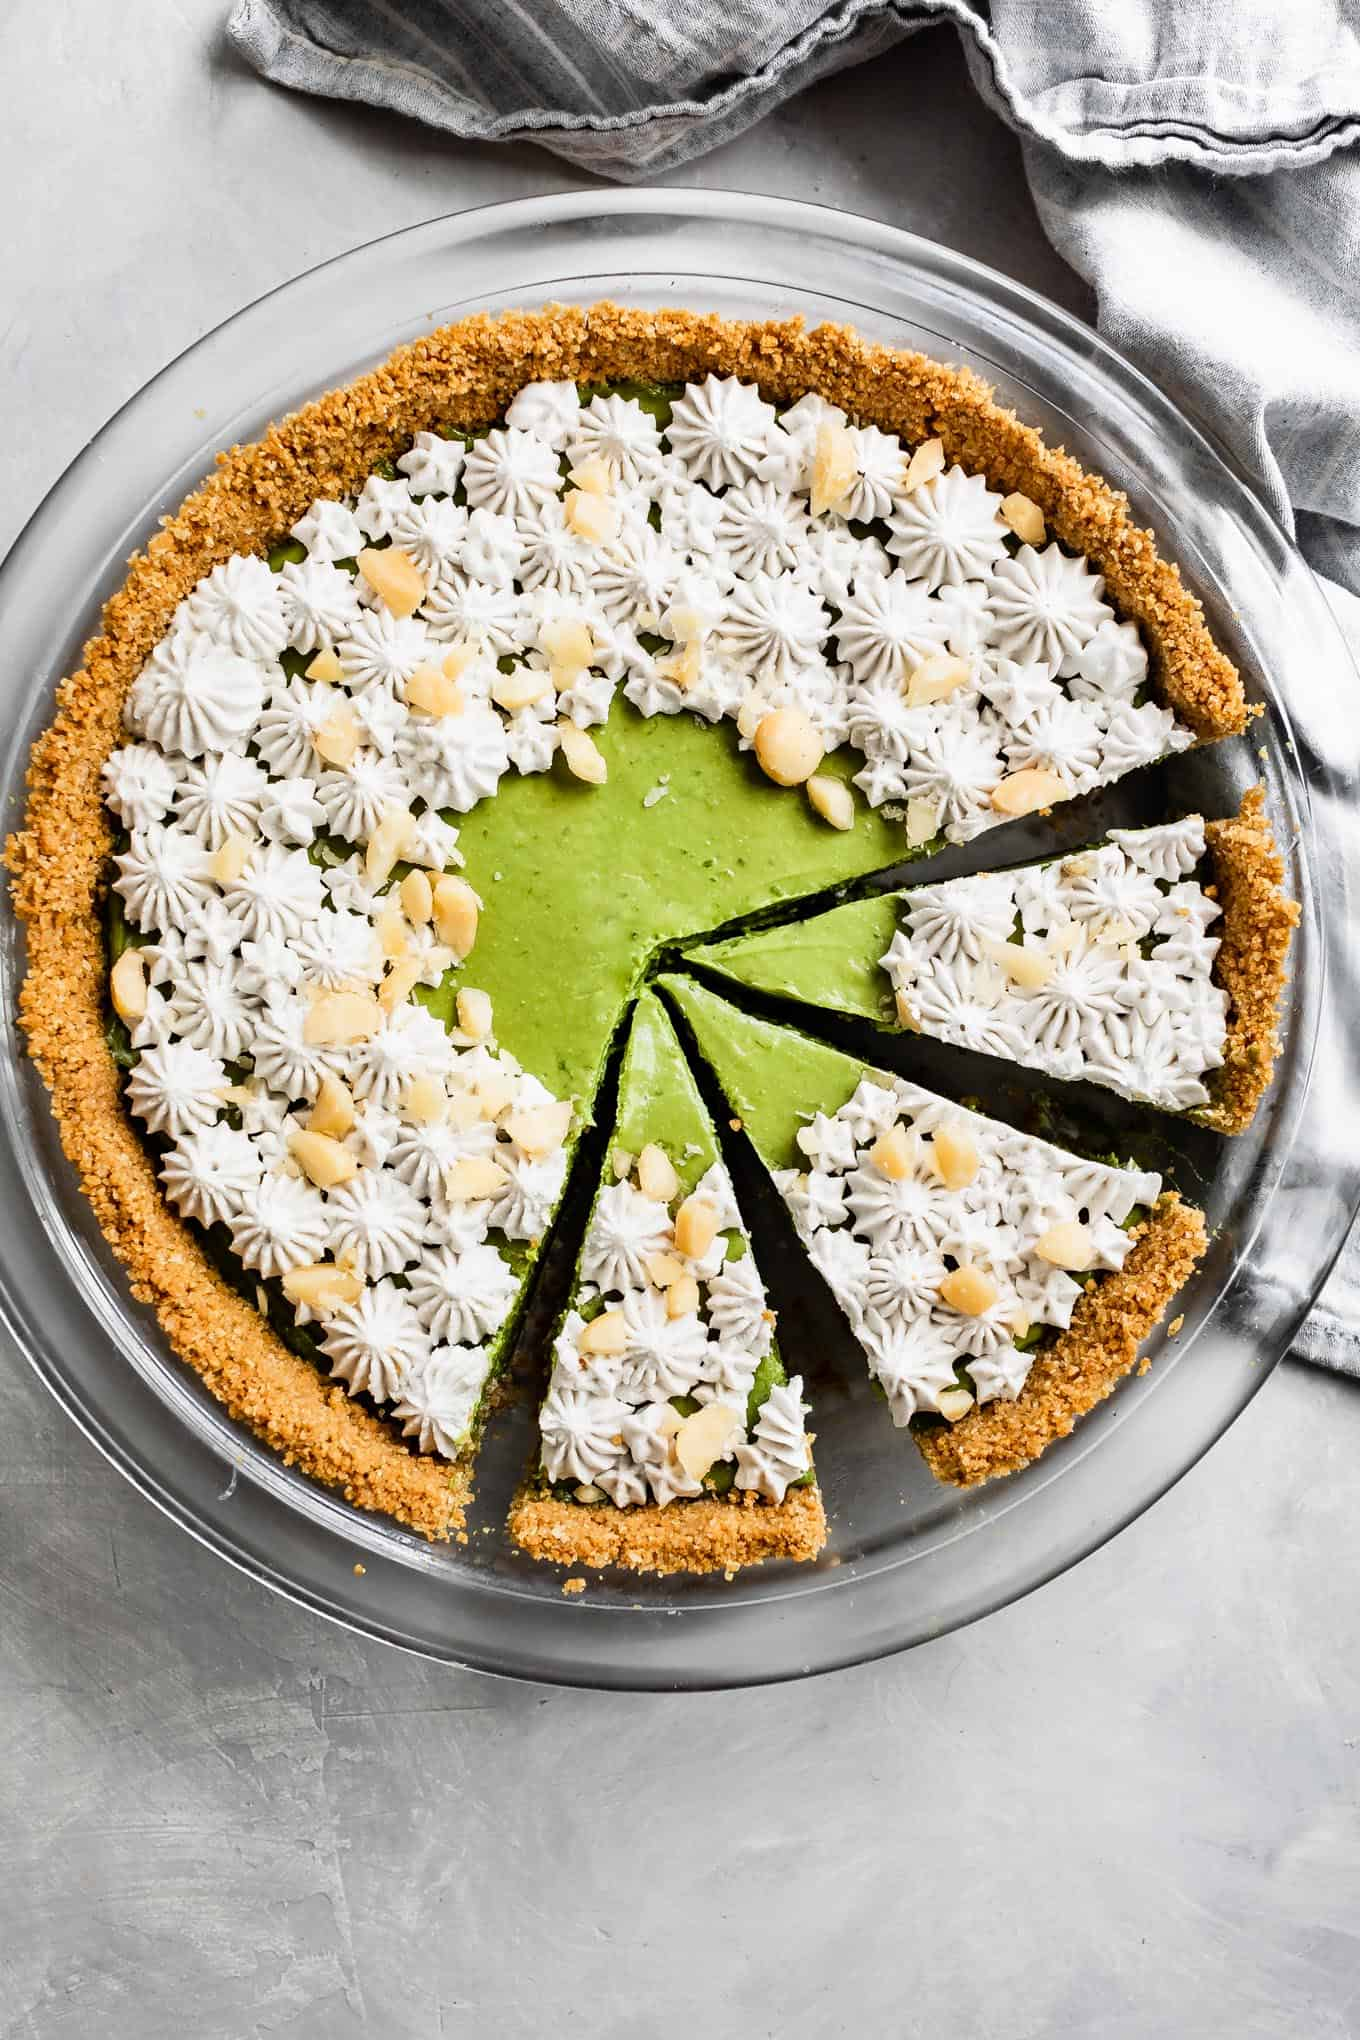 Gluten-Free Key Lime Pie with Matcha